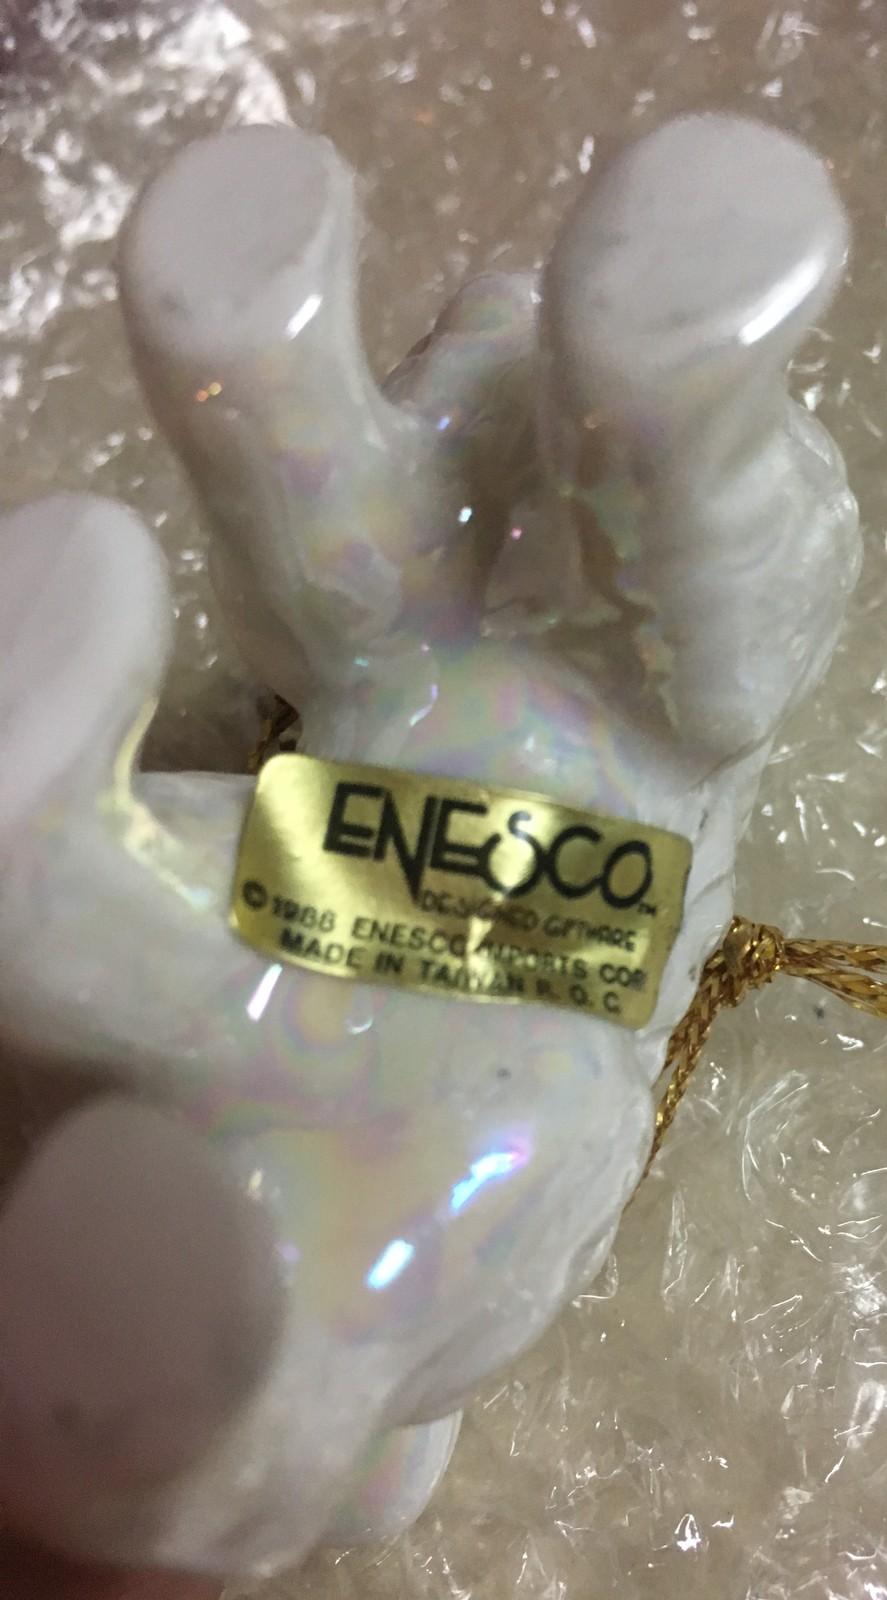 1988 Enesco Kitty Cat Iridescent Ornaments Ceramic